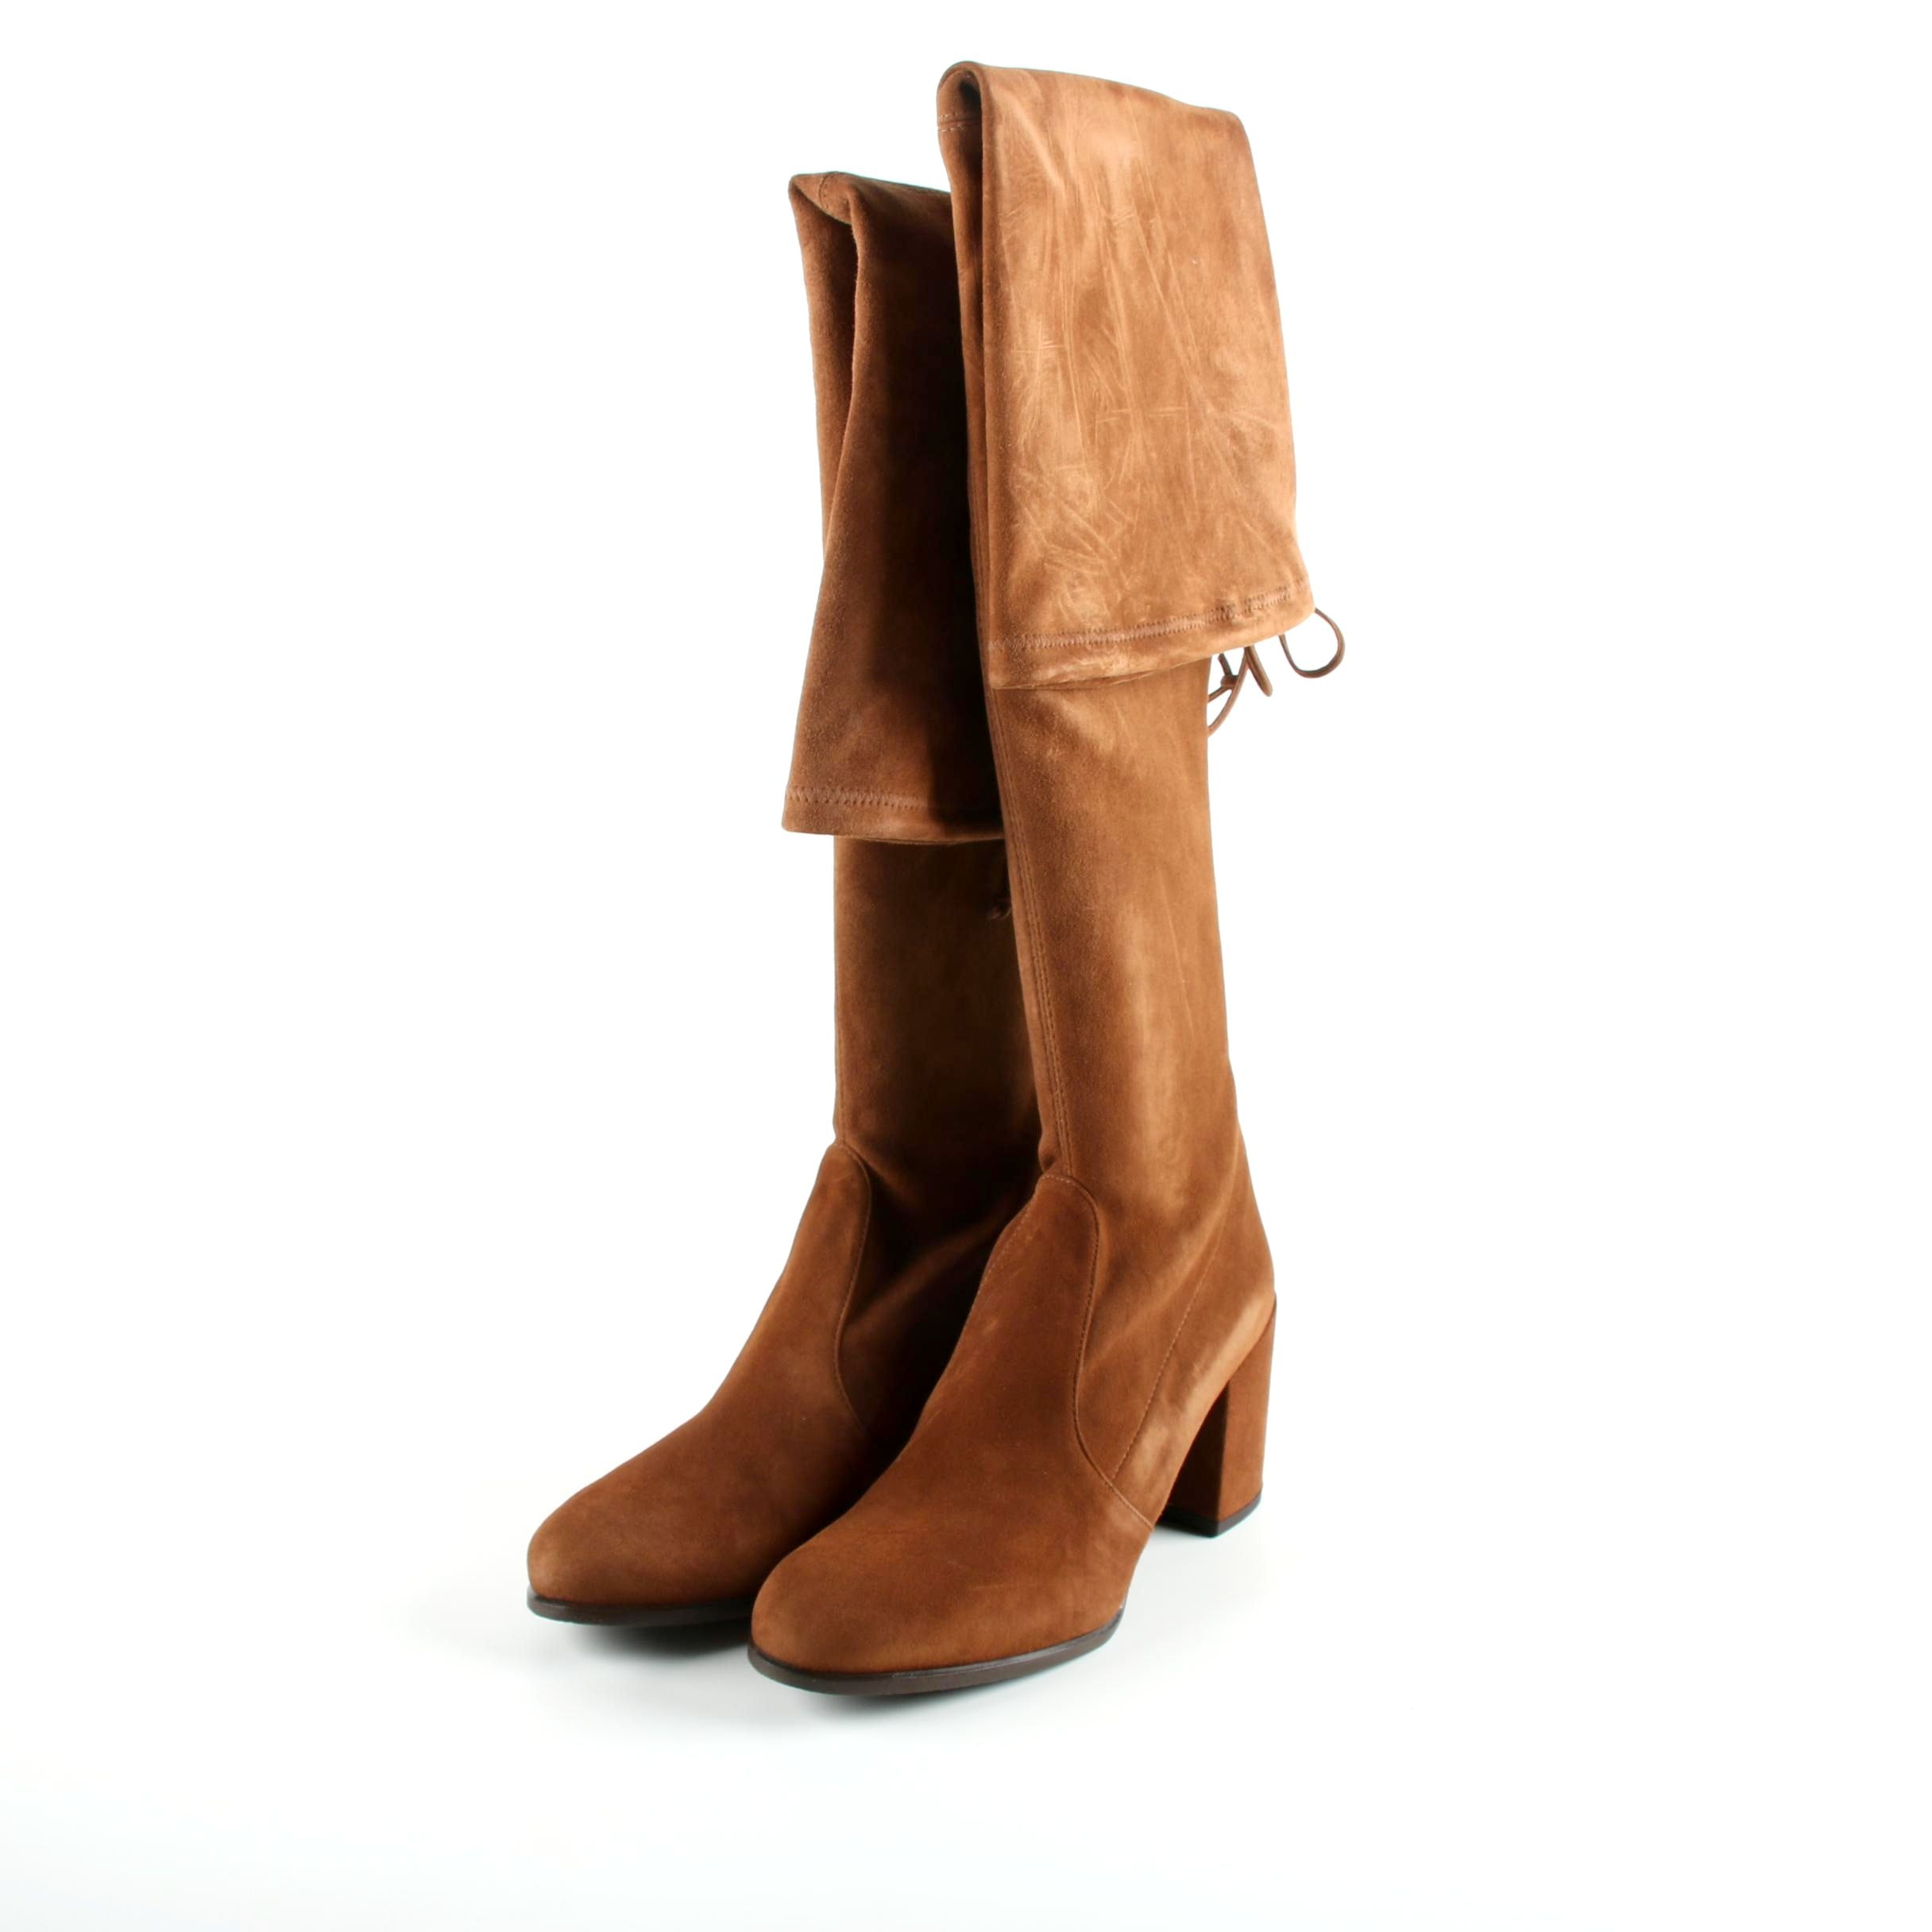 Women's Stuart Weitzman Tieland Walnut Suede Tall Boots